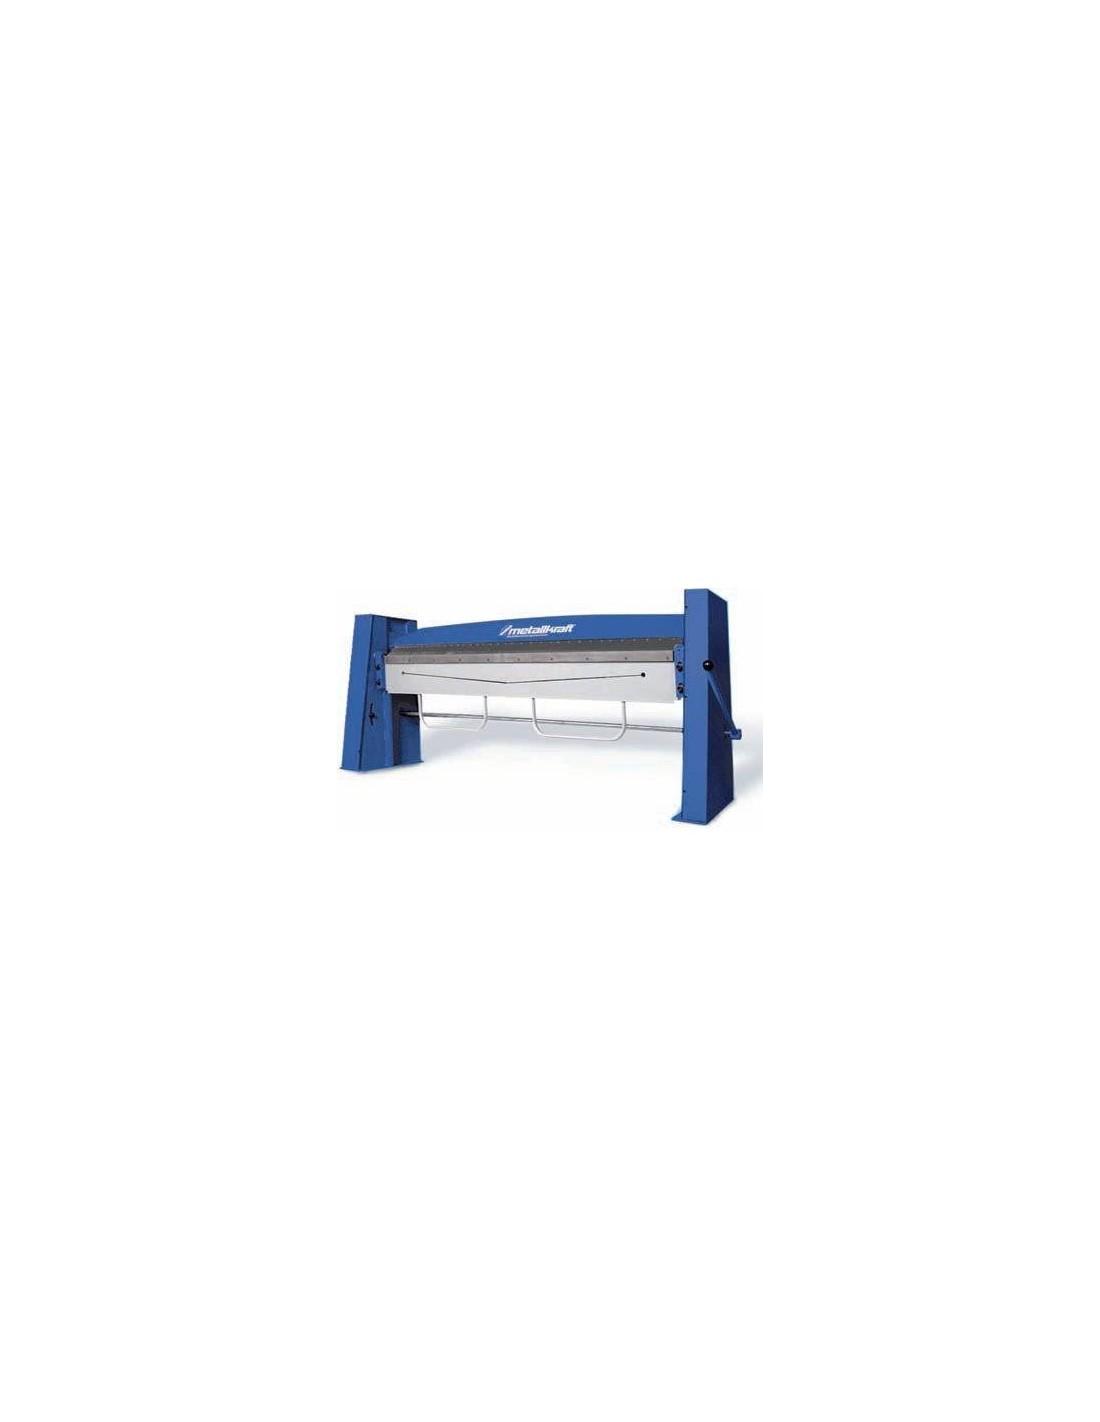 Abkant manual cu lama ascutita Metallkraft HSBM 2620-16